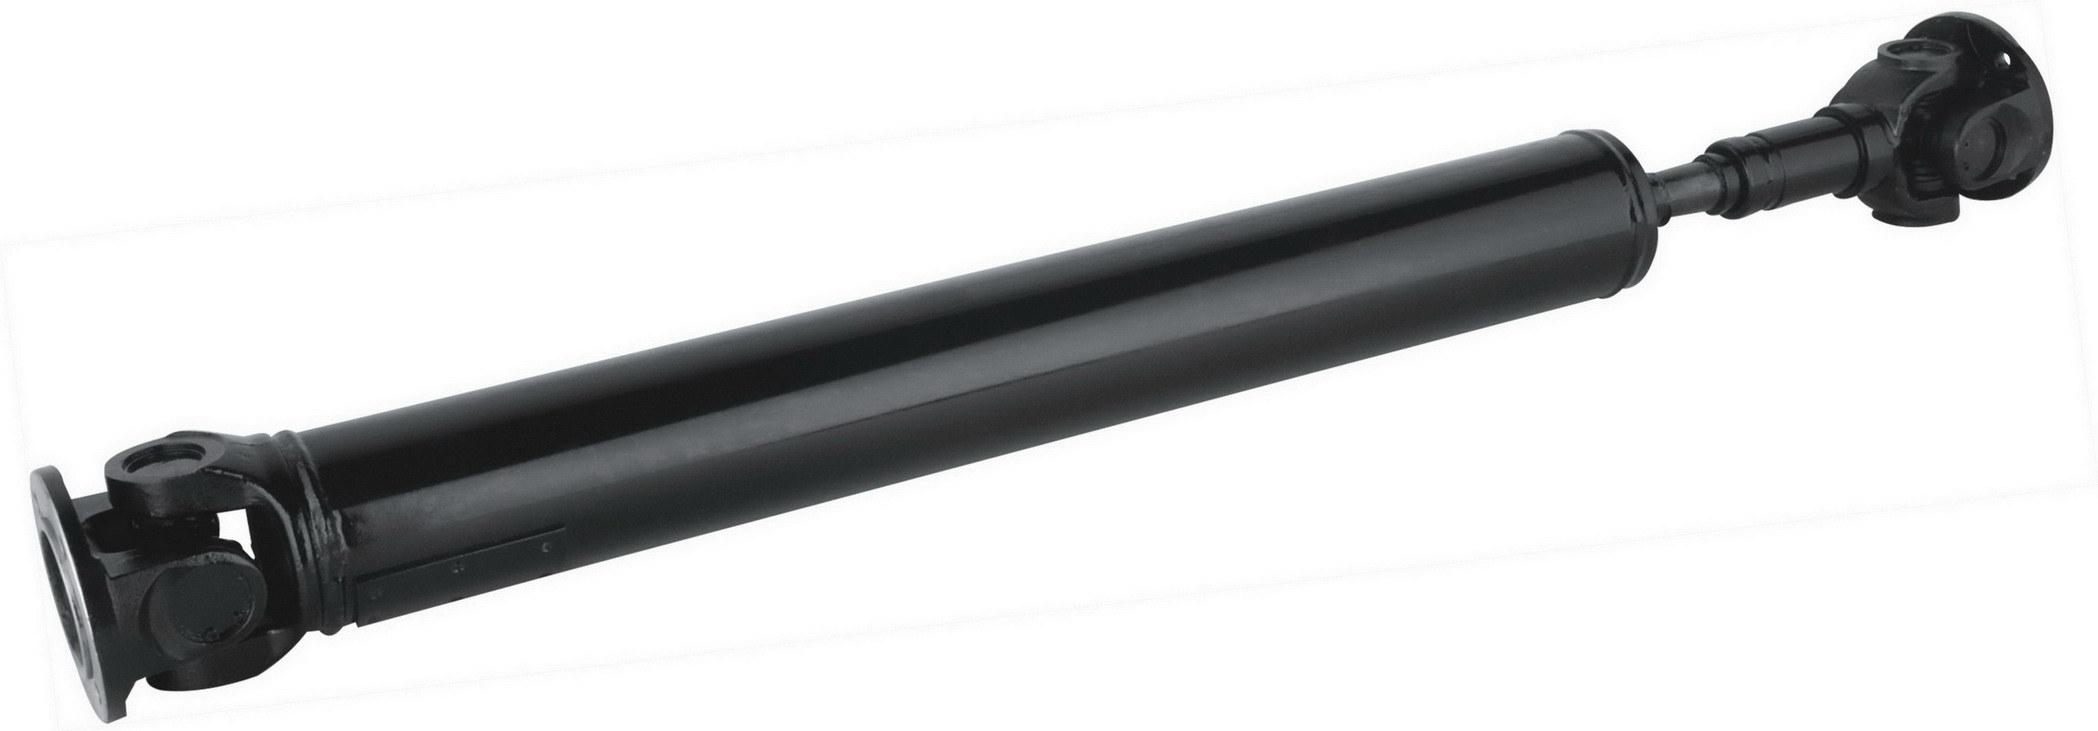 china cardan shaft 21211 2201012 for lada niva ht 211 2 china cardan shaft drive shaft. Black Bedroom Furniture Sets. Home Design Ideas